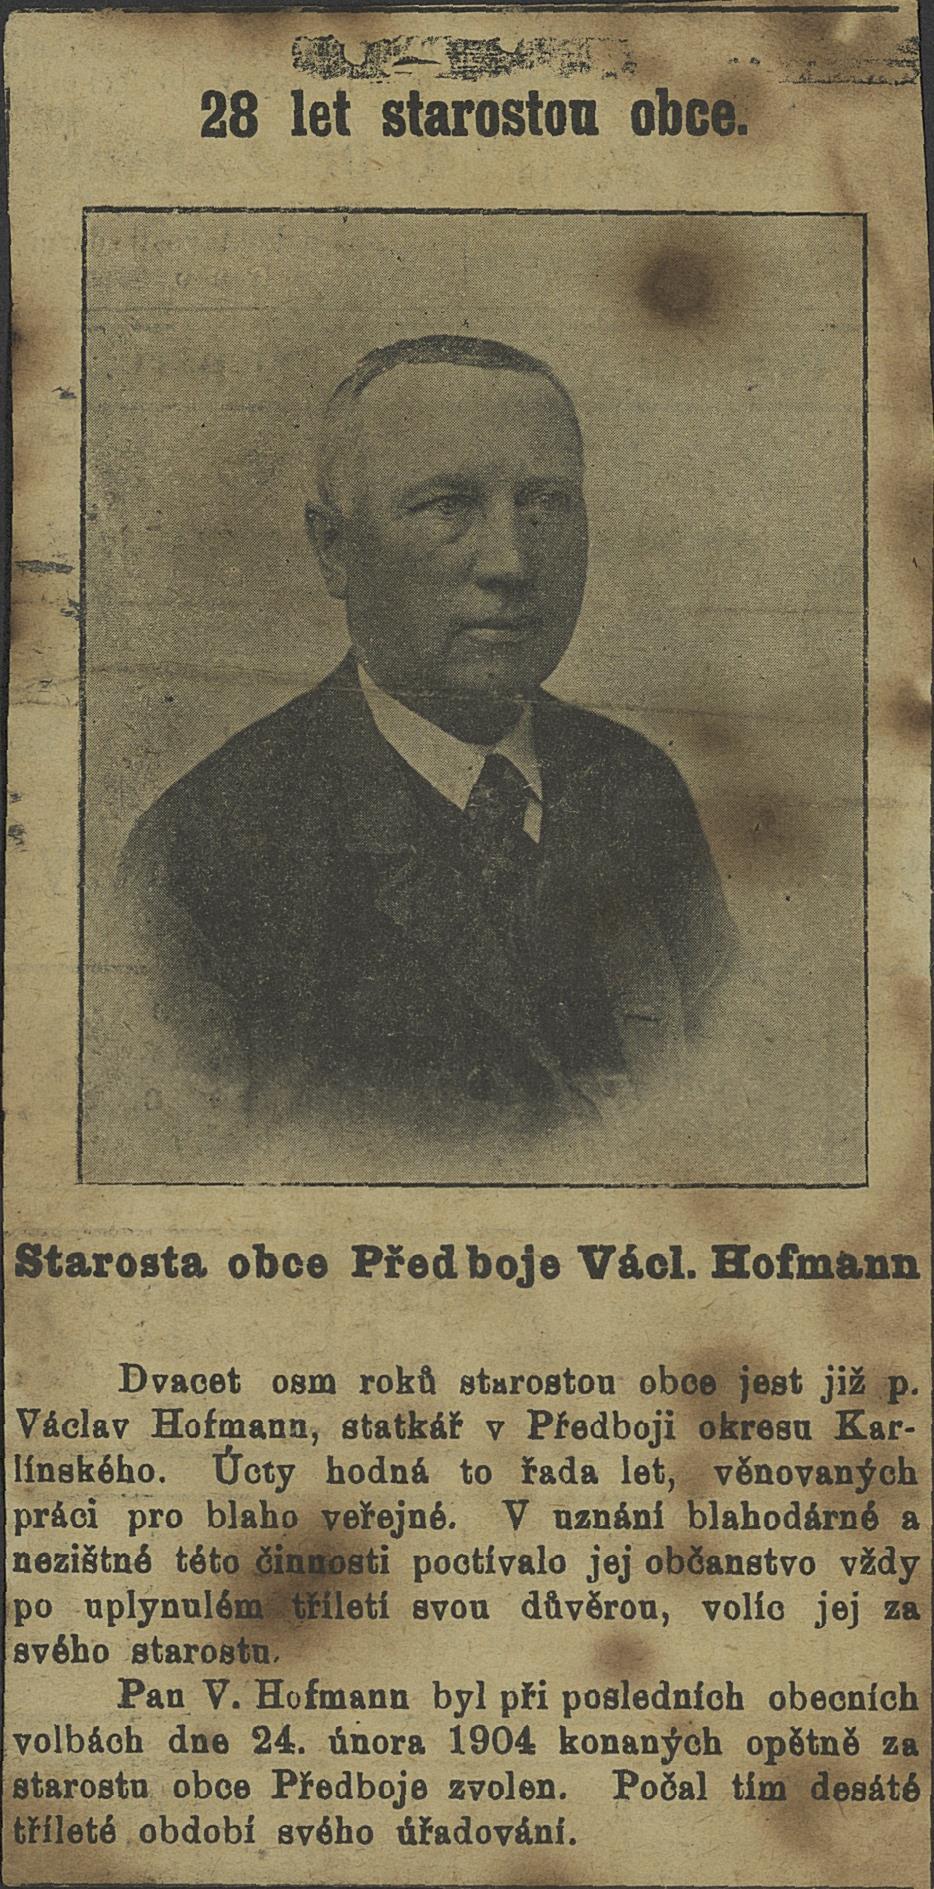 hofmann starosta